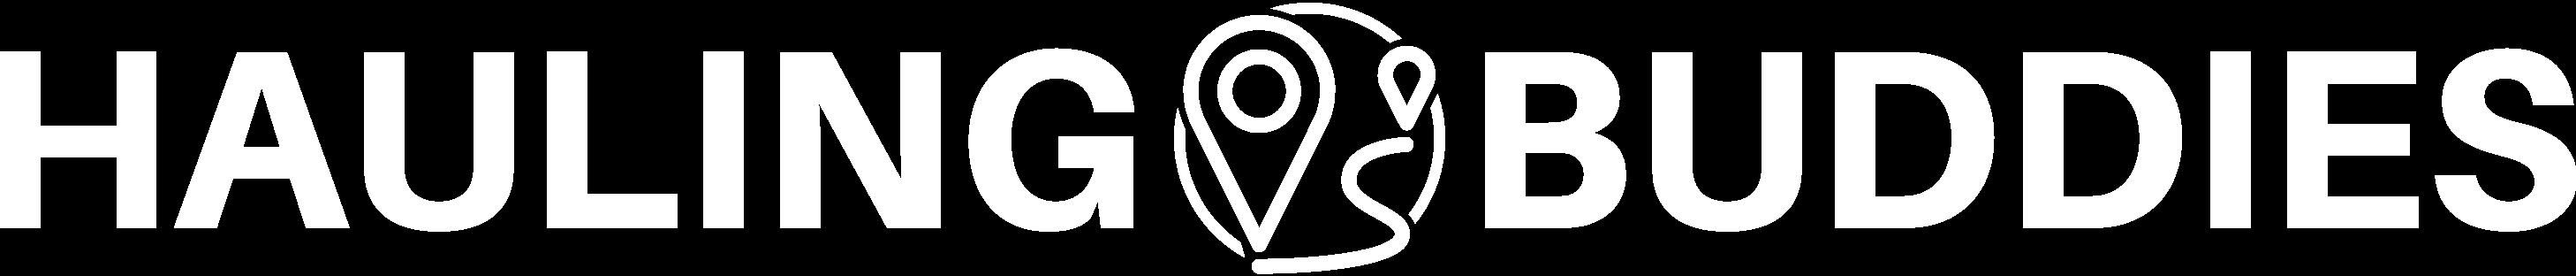 Hauling Buddies logo